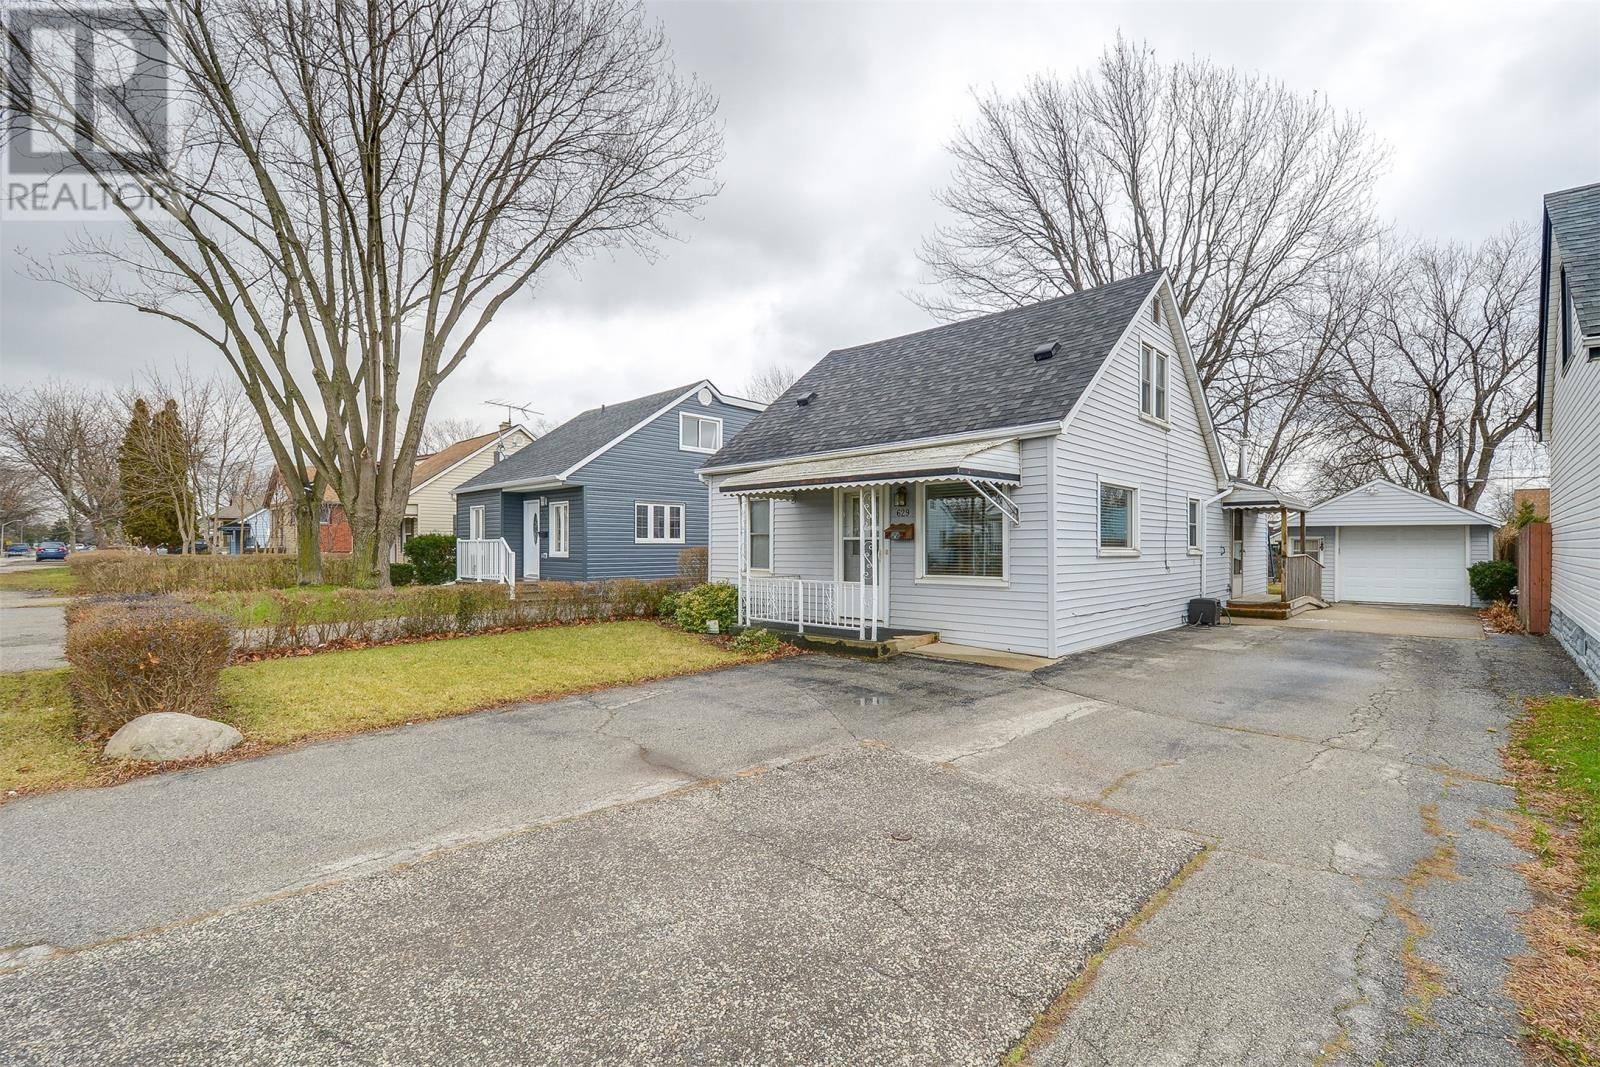 House for sale at 629 Vanier St Windsor Ontario - MLS: 20000444